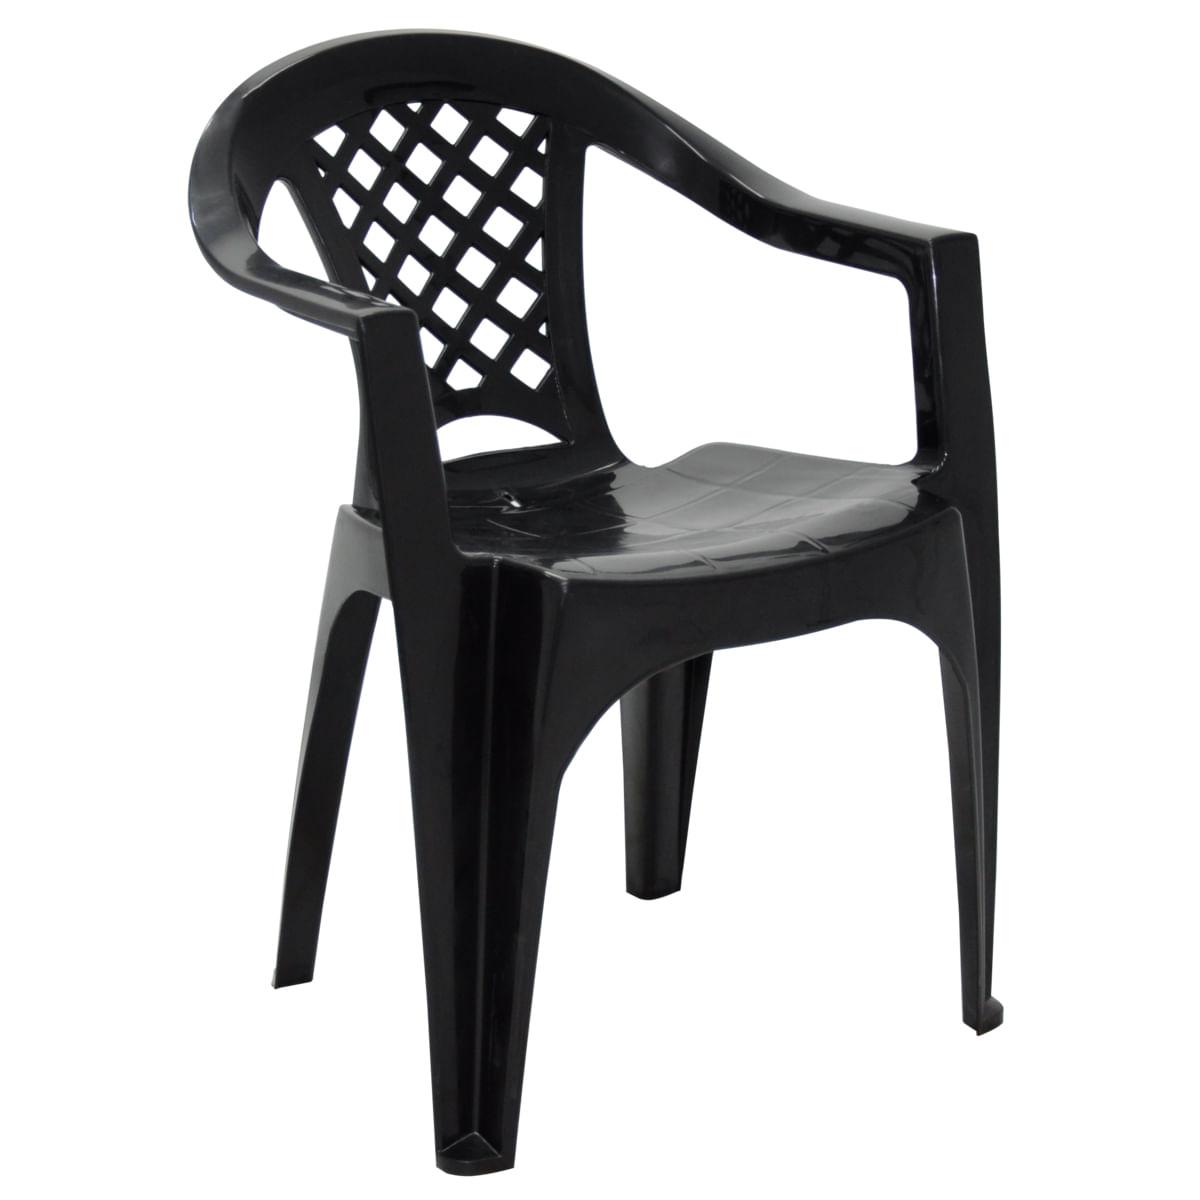 Cadeira Tramontina Iguape em Polipropileno Preto